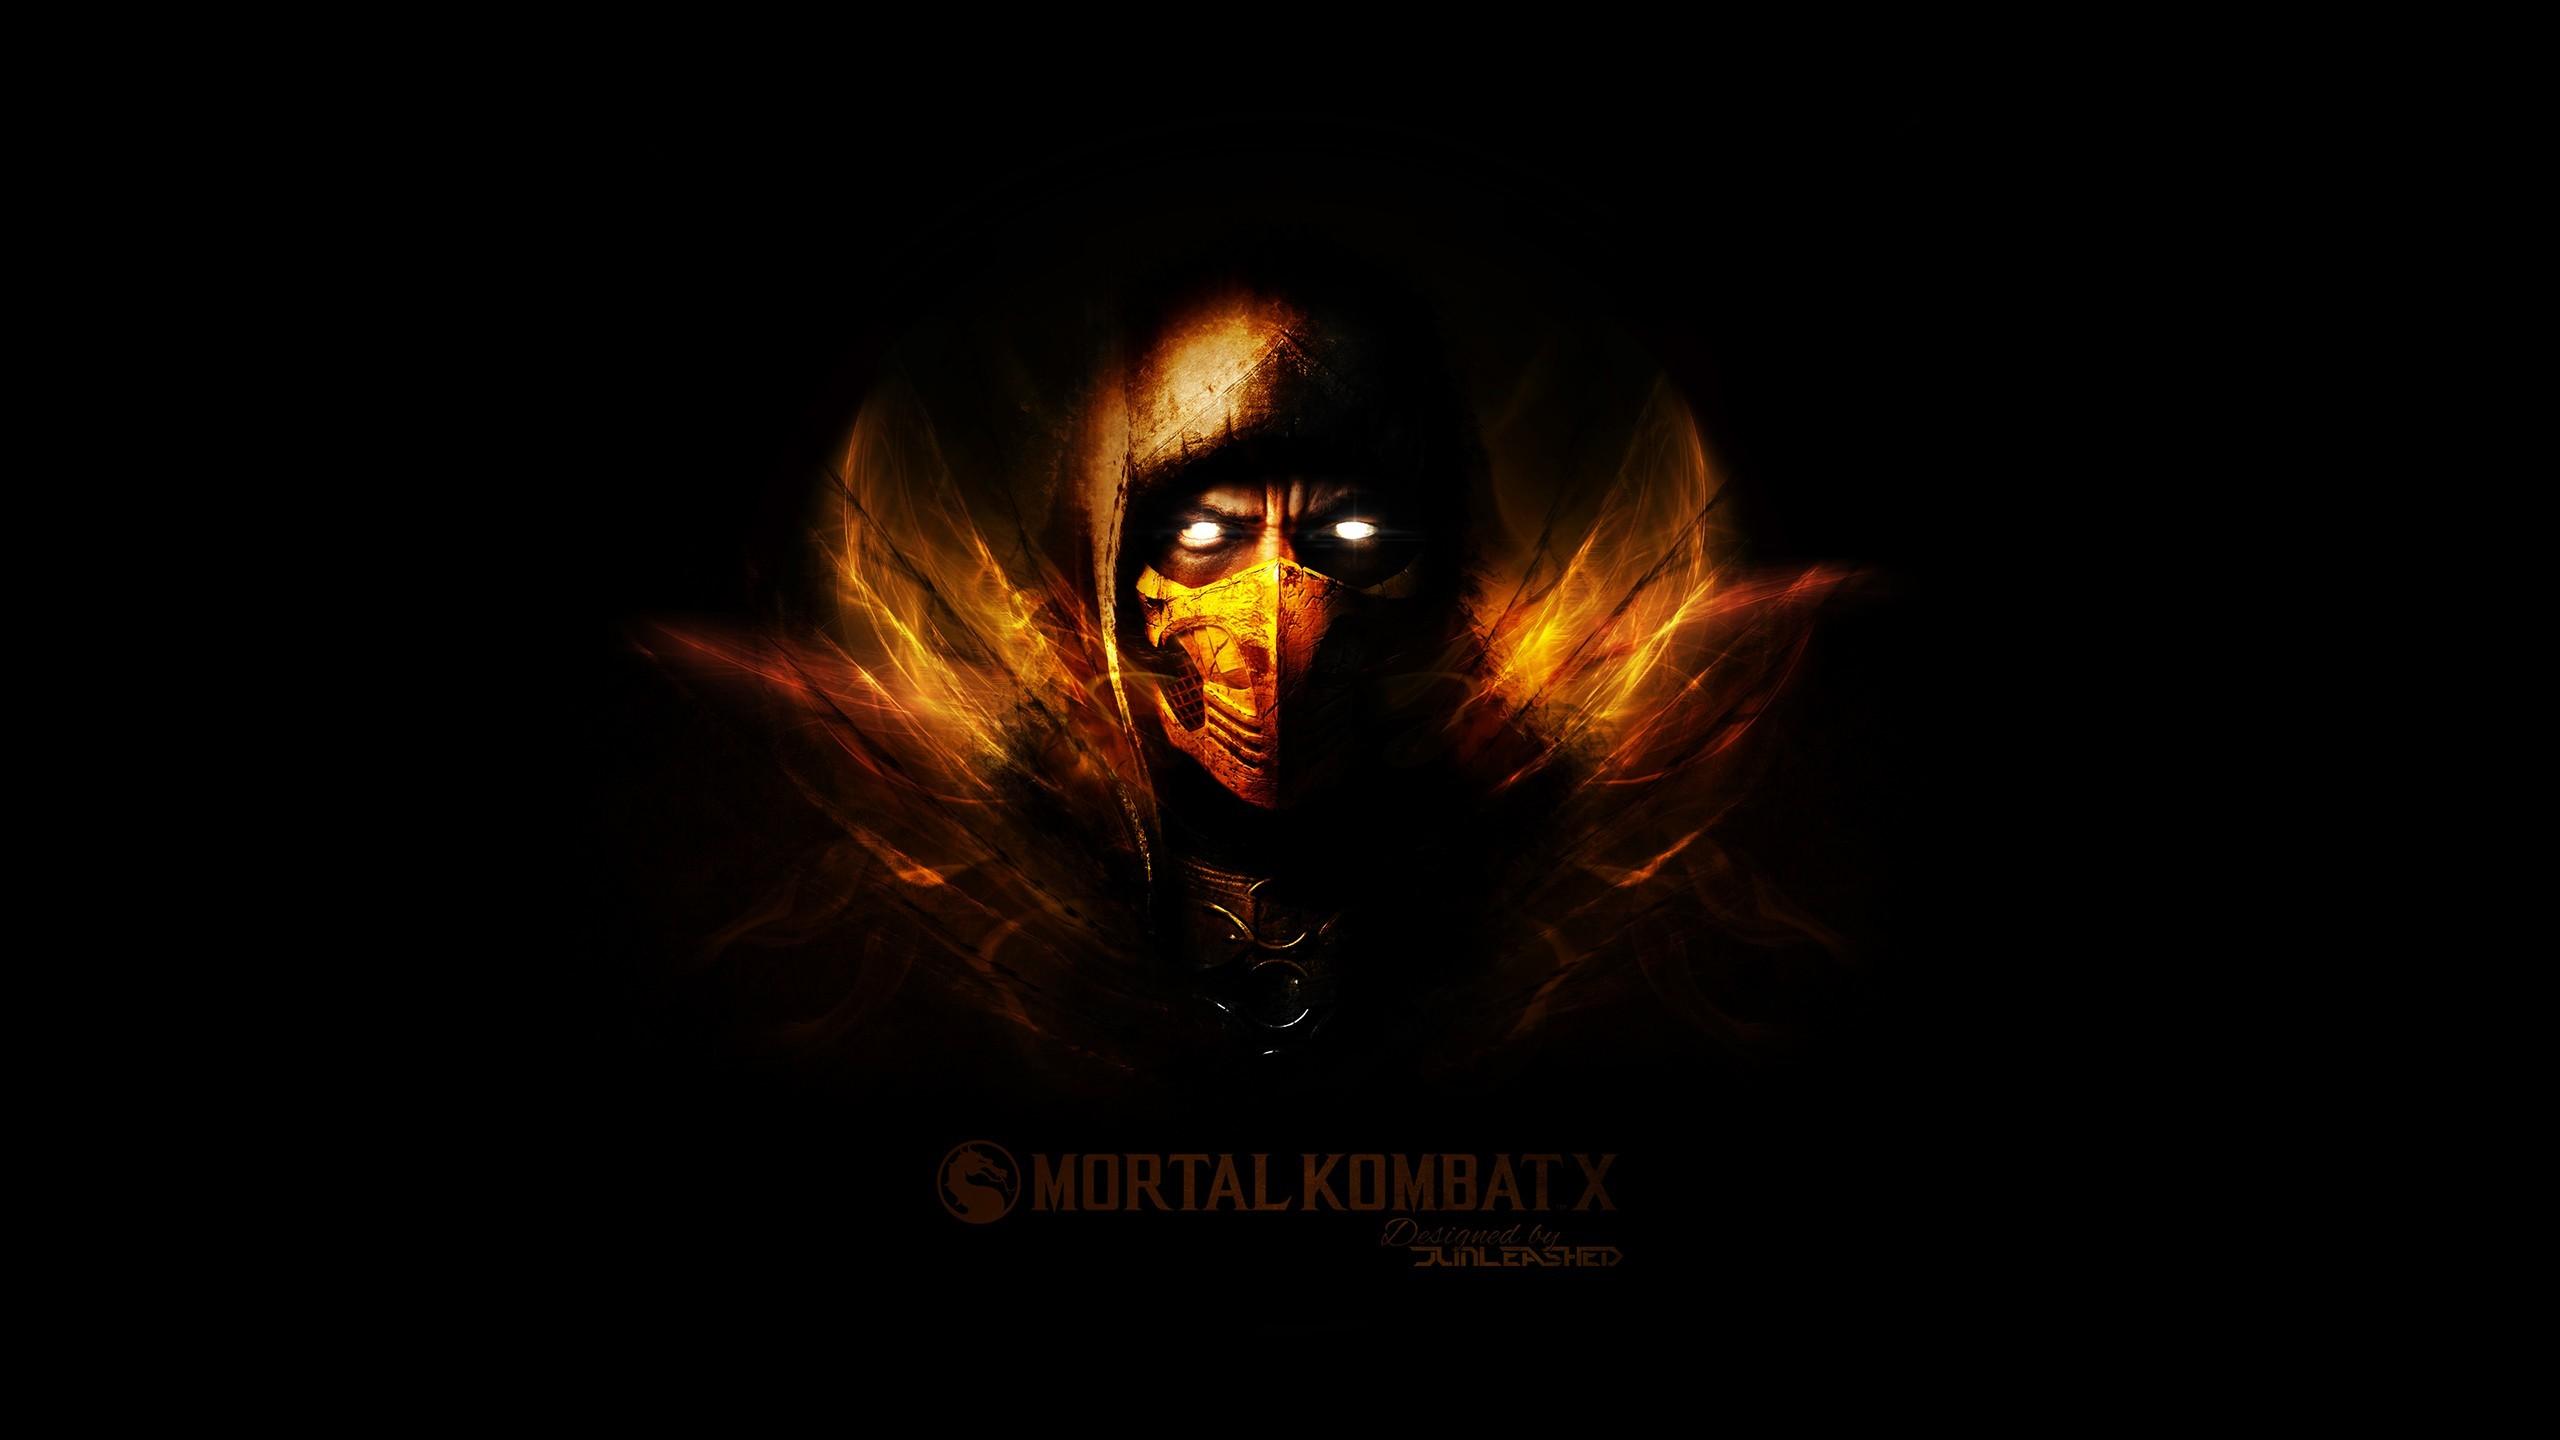 Mortal Kombat Scorpion Drawing HD desktop wallpaper High